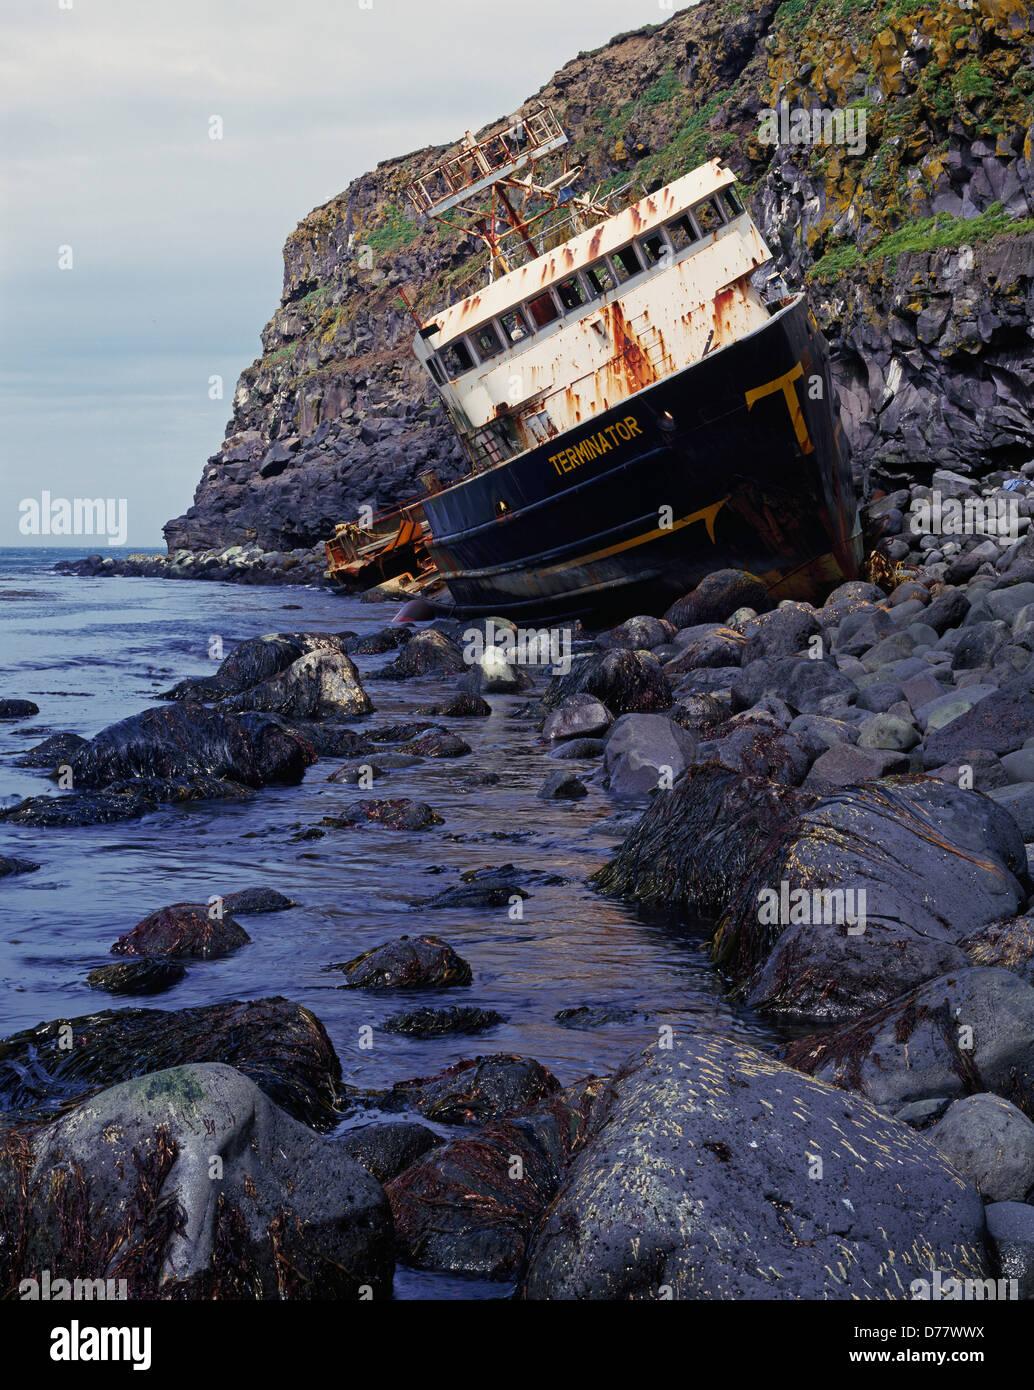 Pribilof Islands | Birding for Life |Saint Paul Alaska